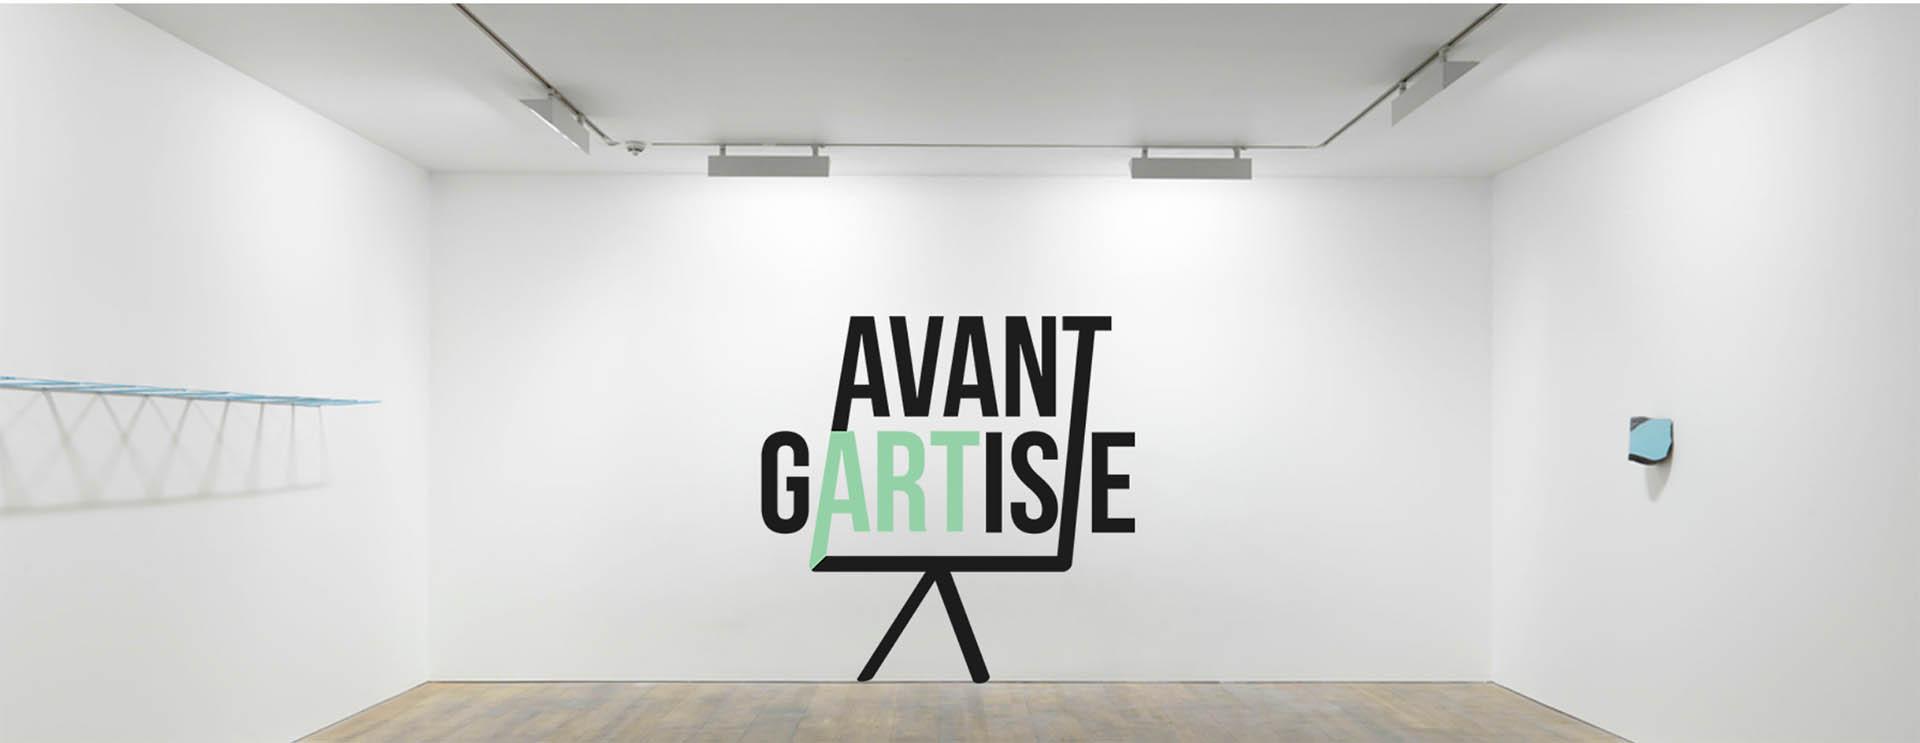 Avant-Garde Creative collective New York